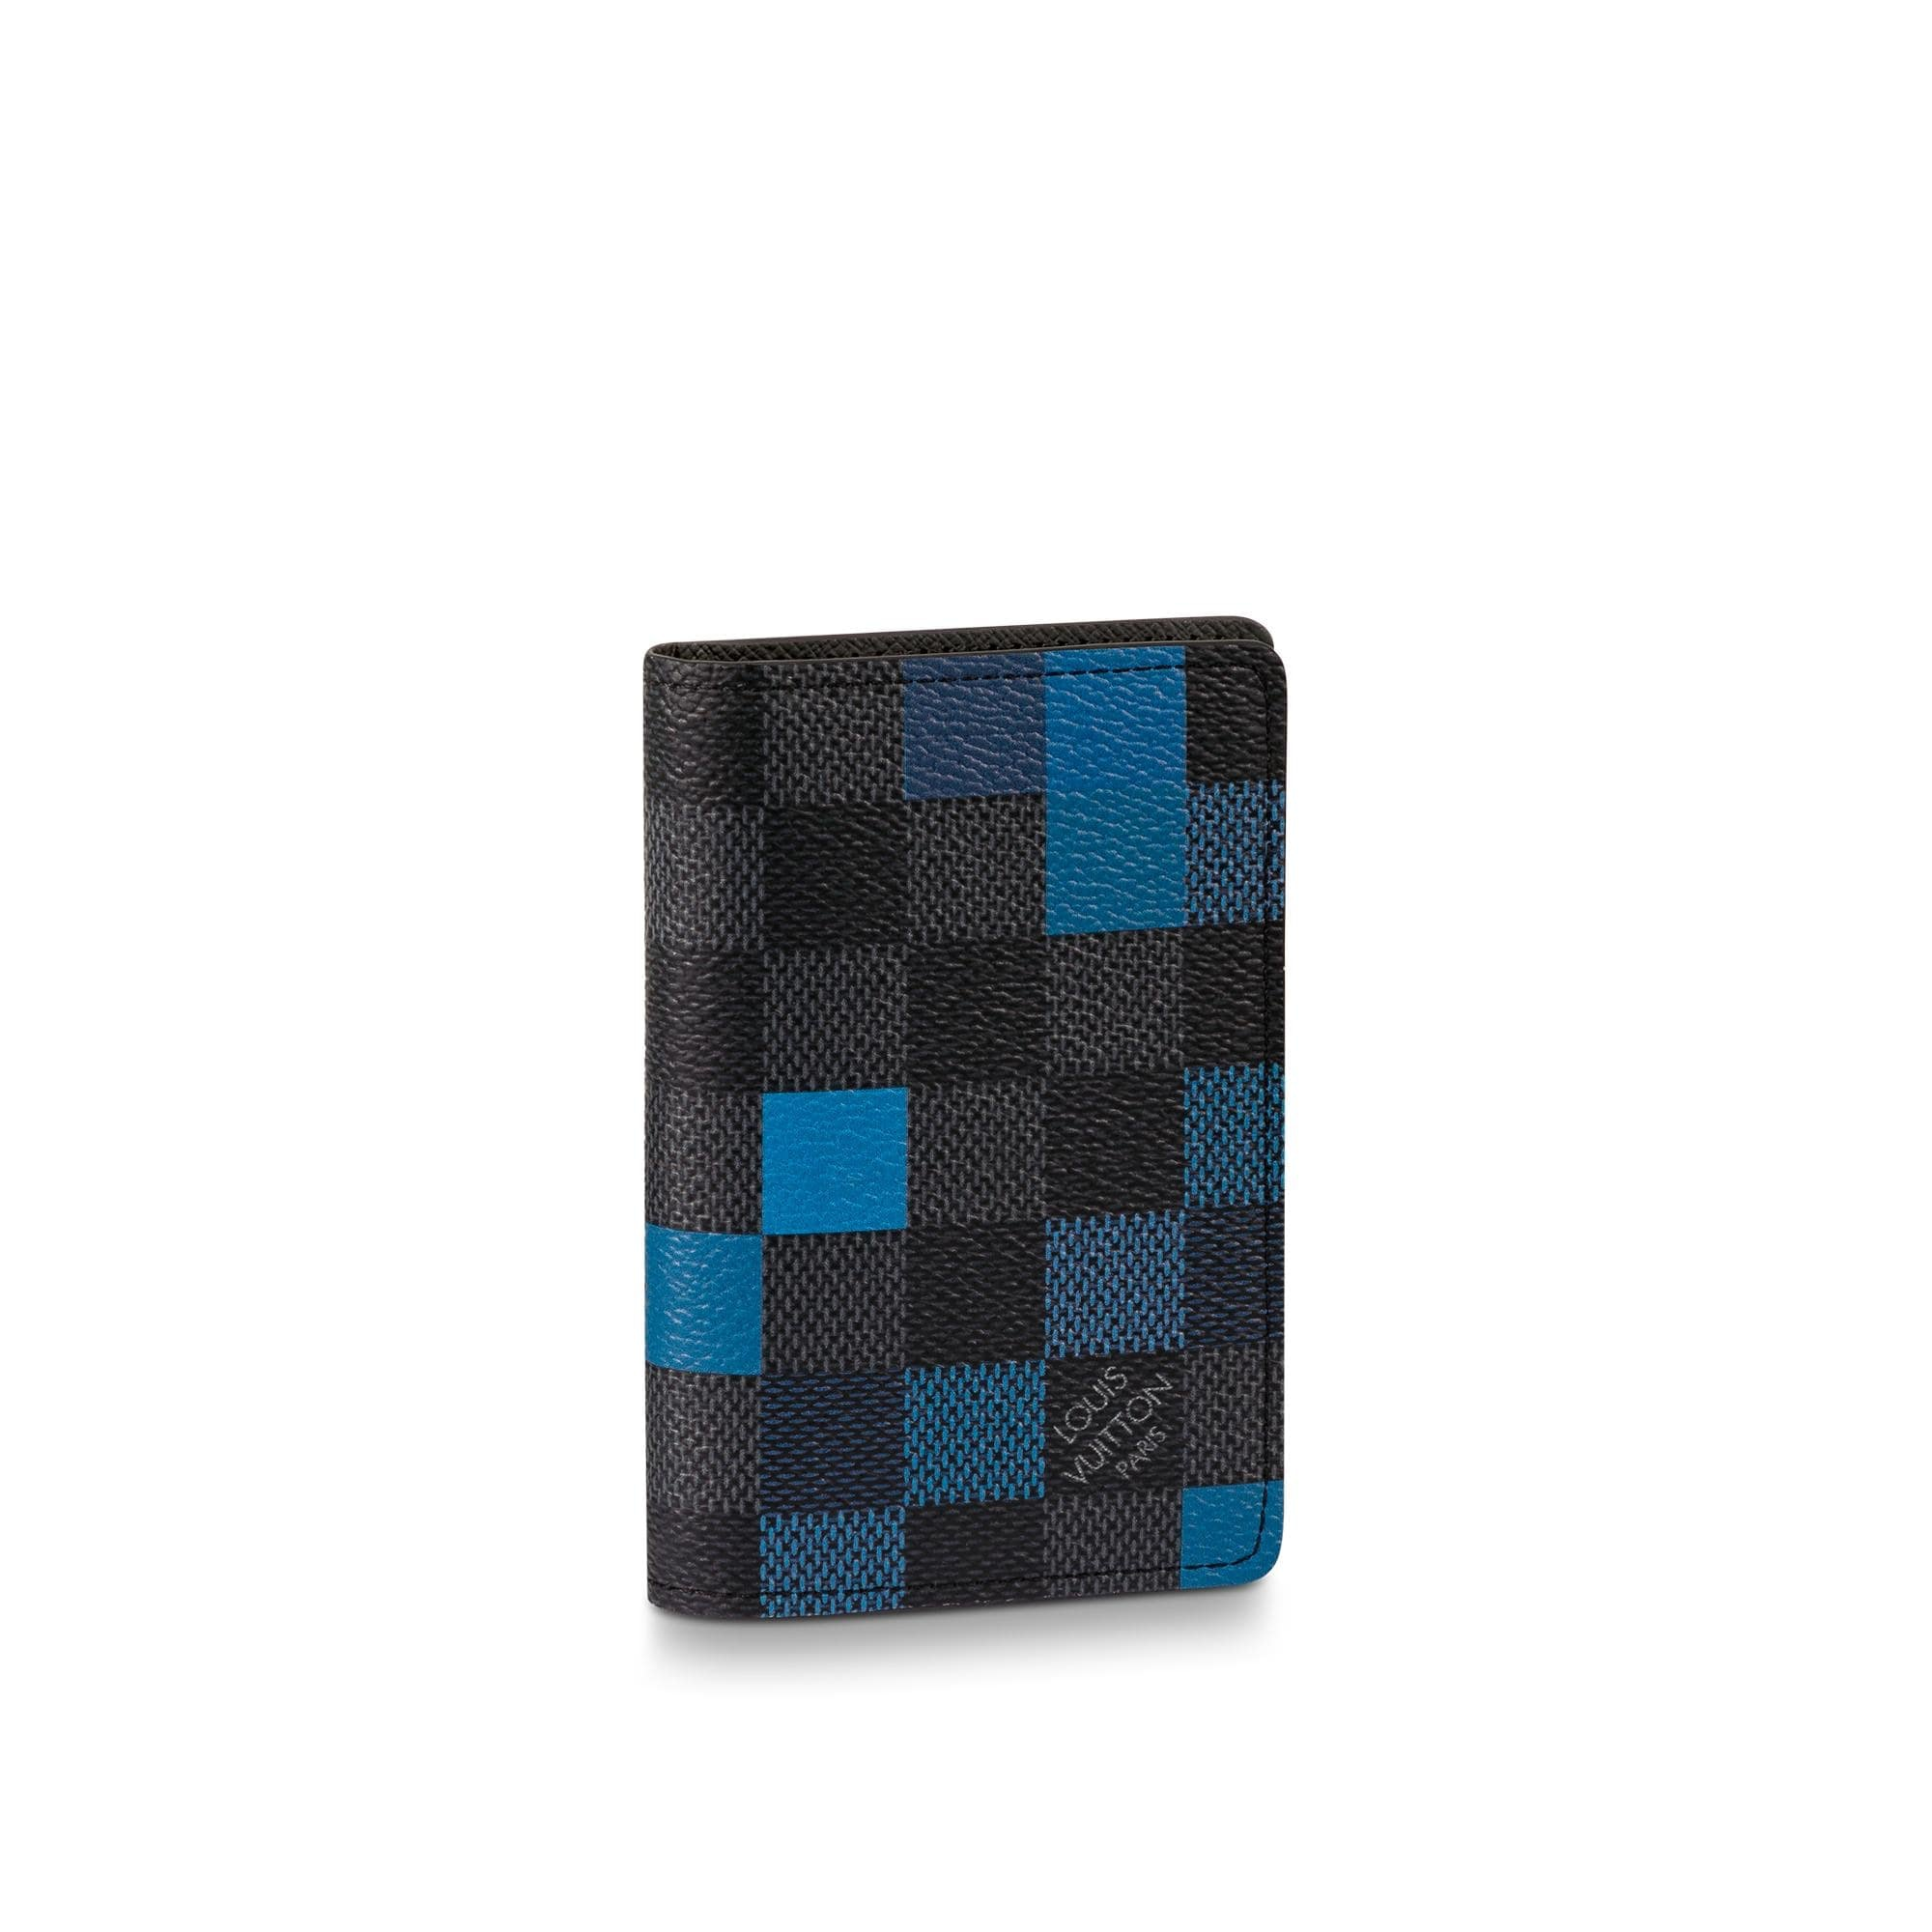 Louis Vuitton Pocket Organizer Damier Graphite Pixel Bleu